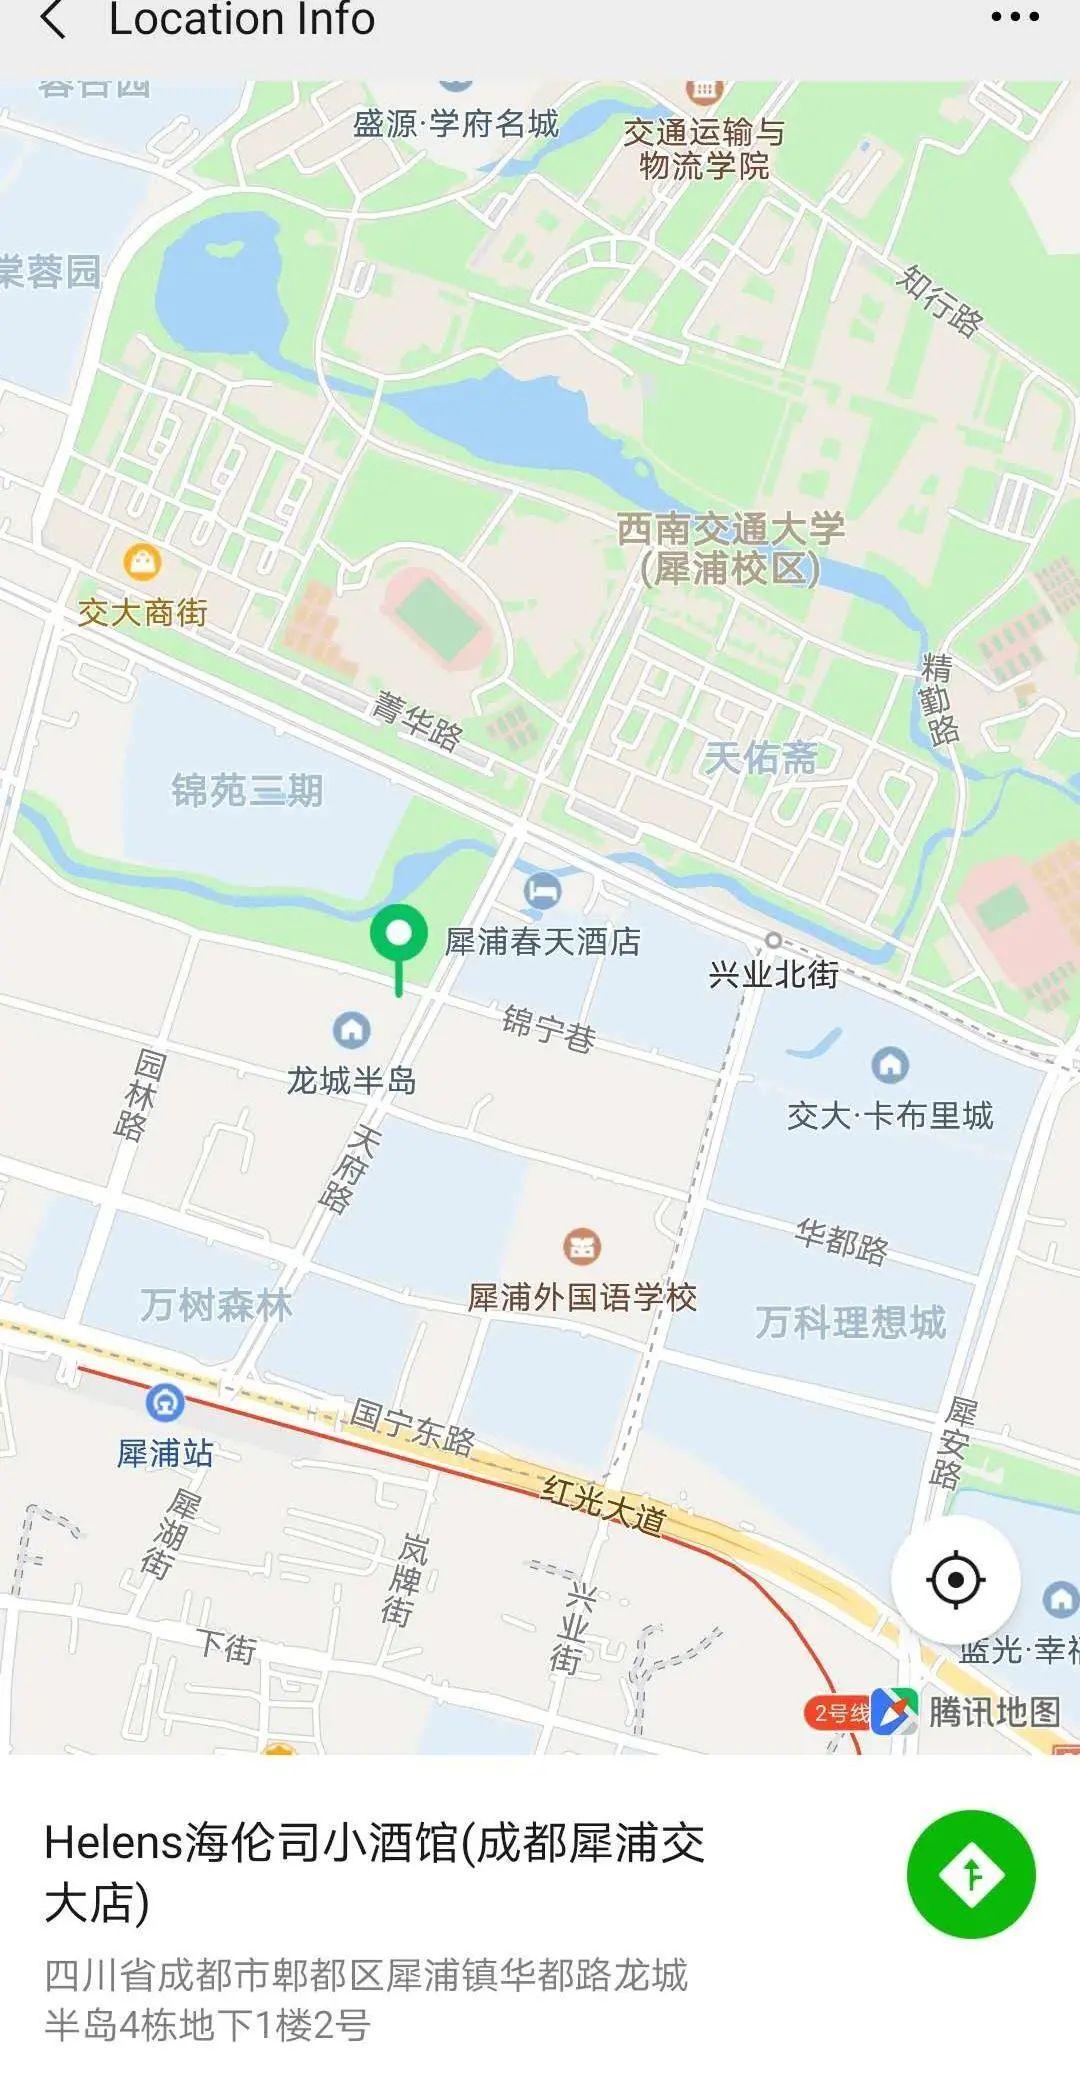 Helen's Bar (Chengdu) Doesn't Accept Foreigners